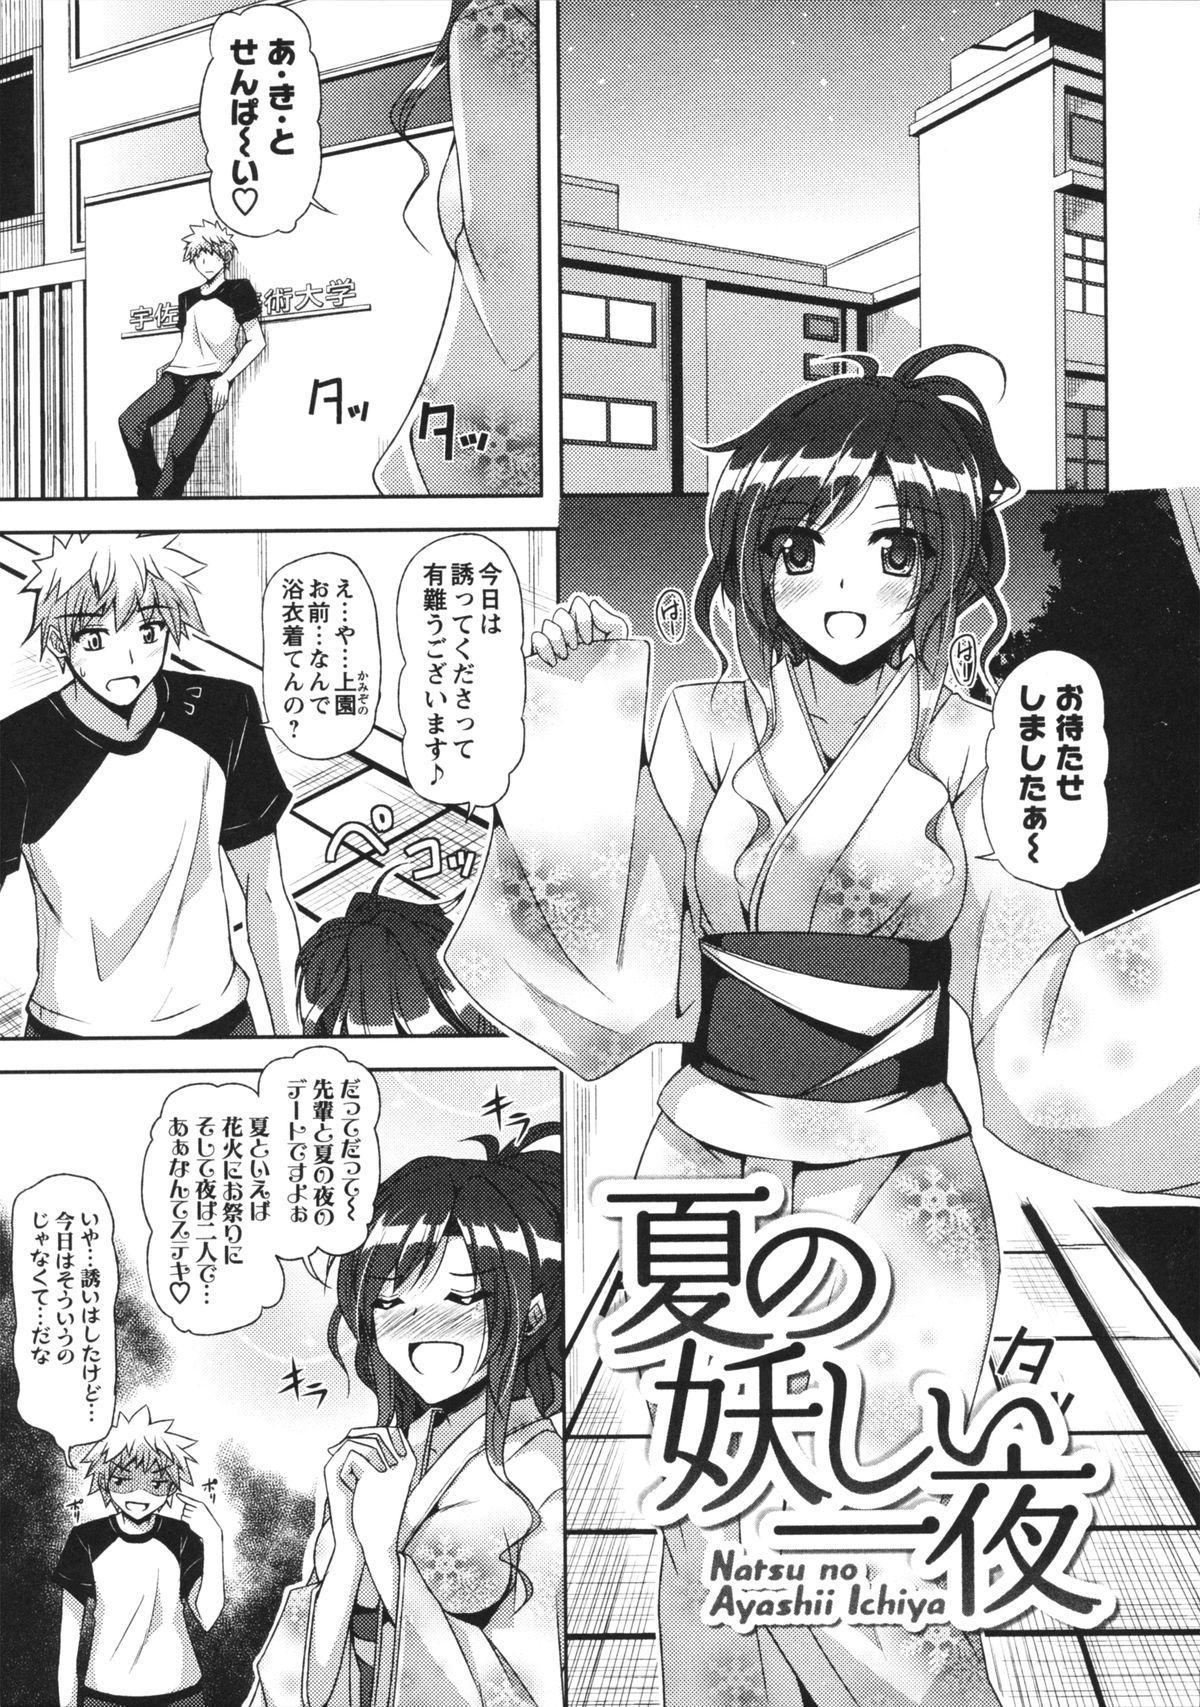 Binkan Niku Kanojyo 36